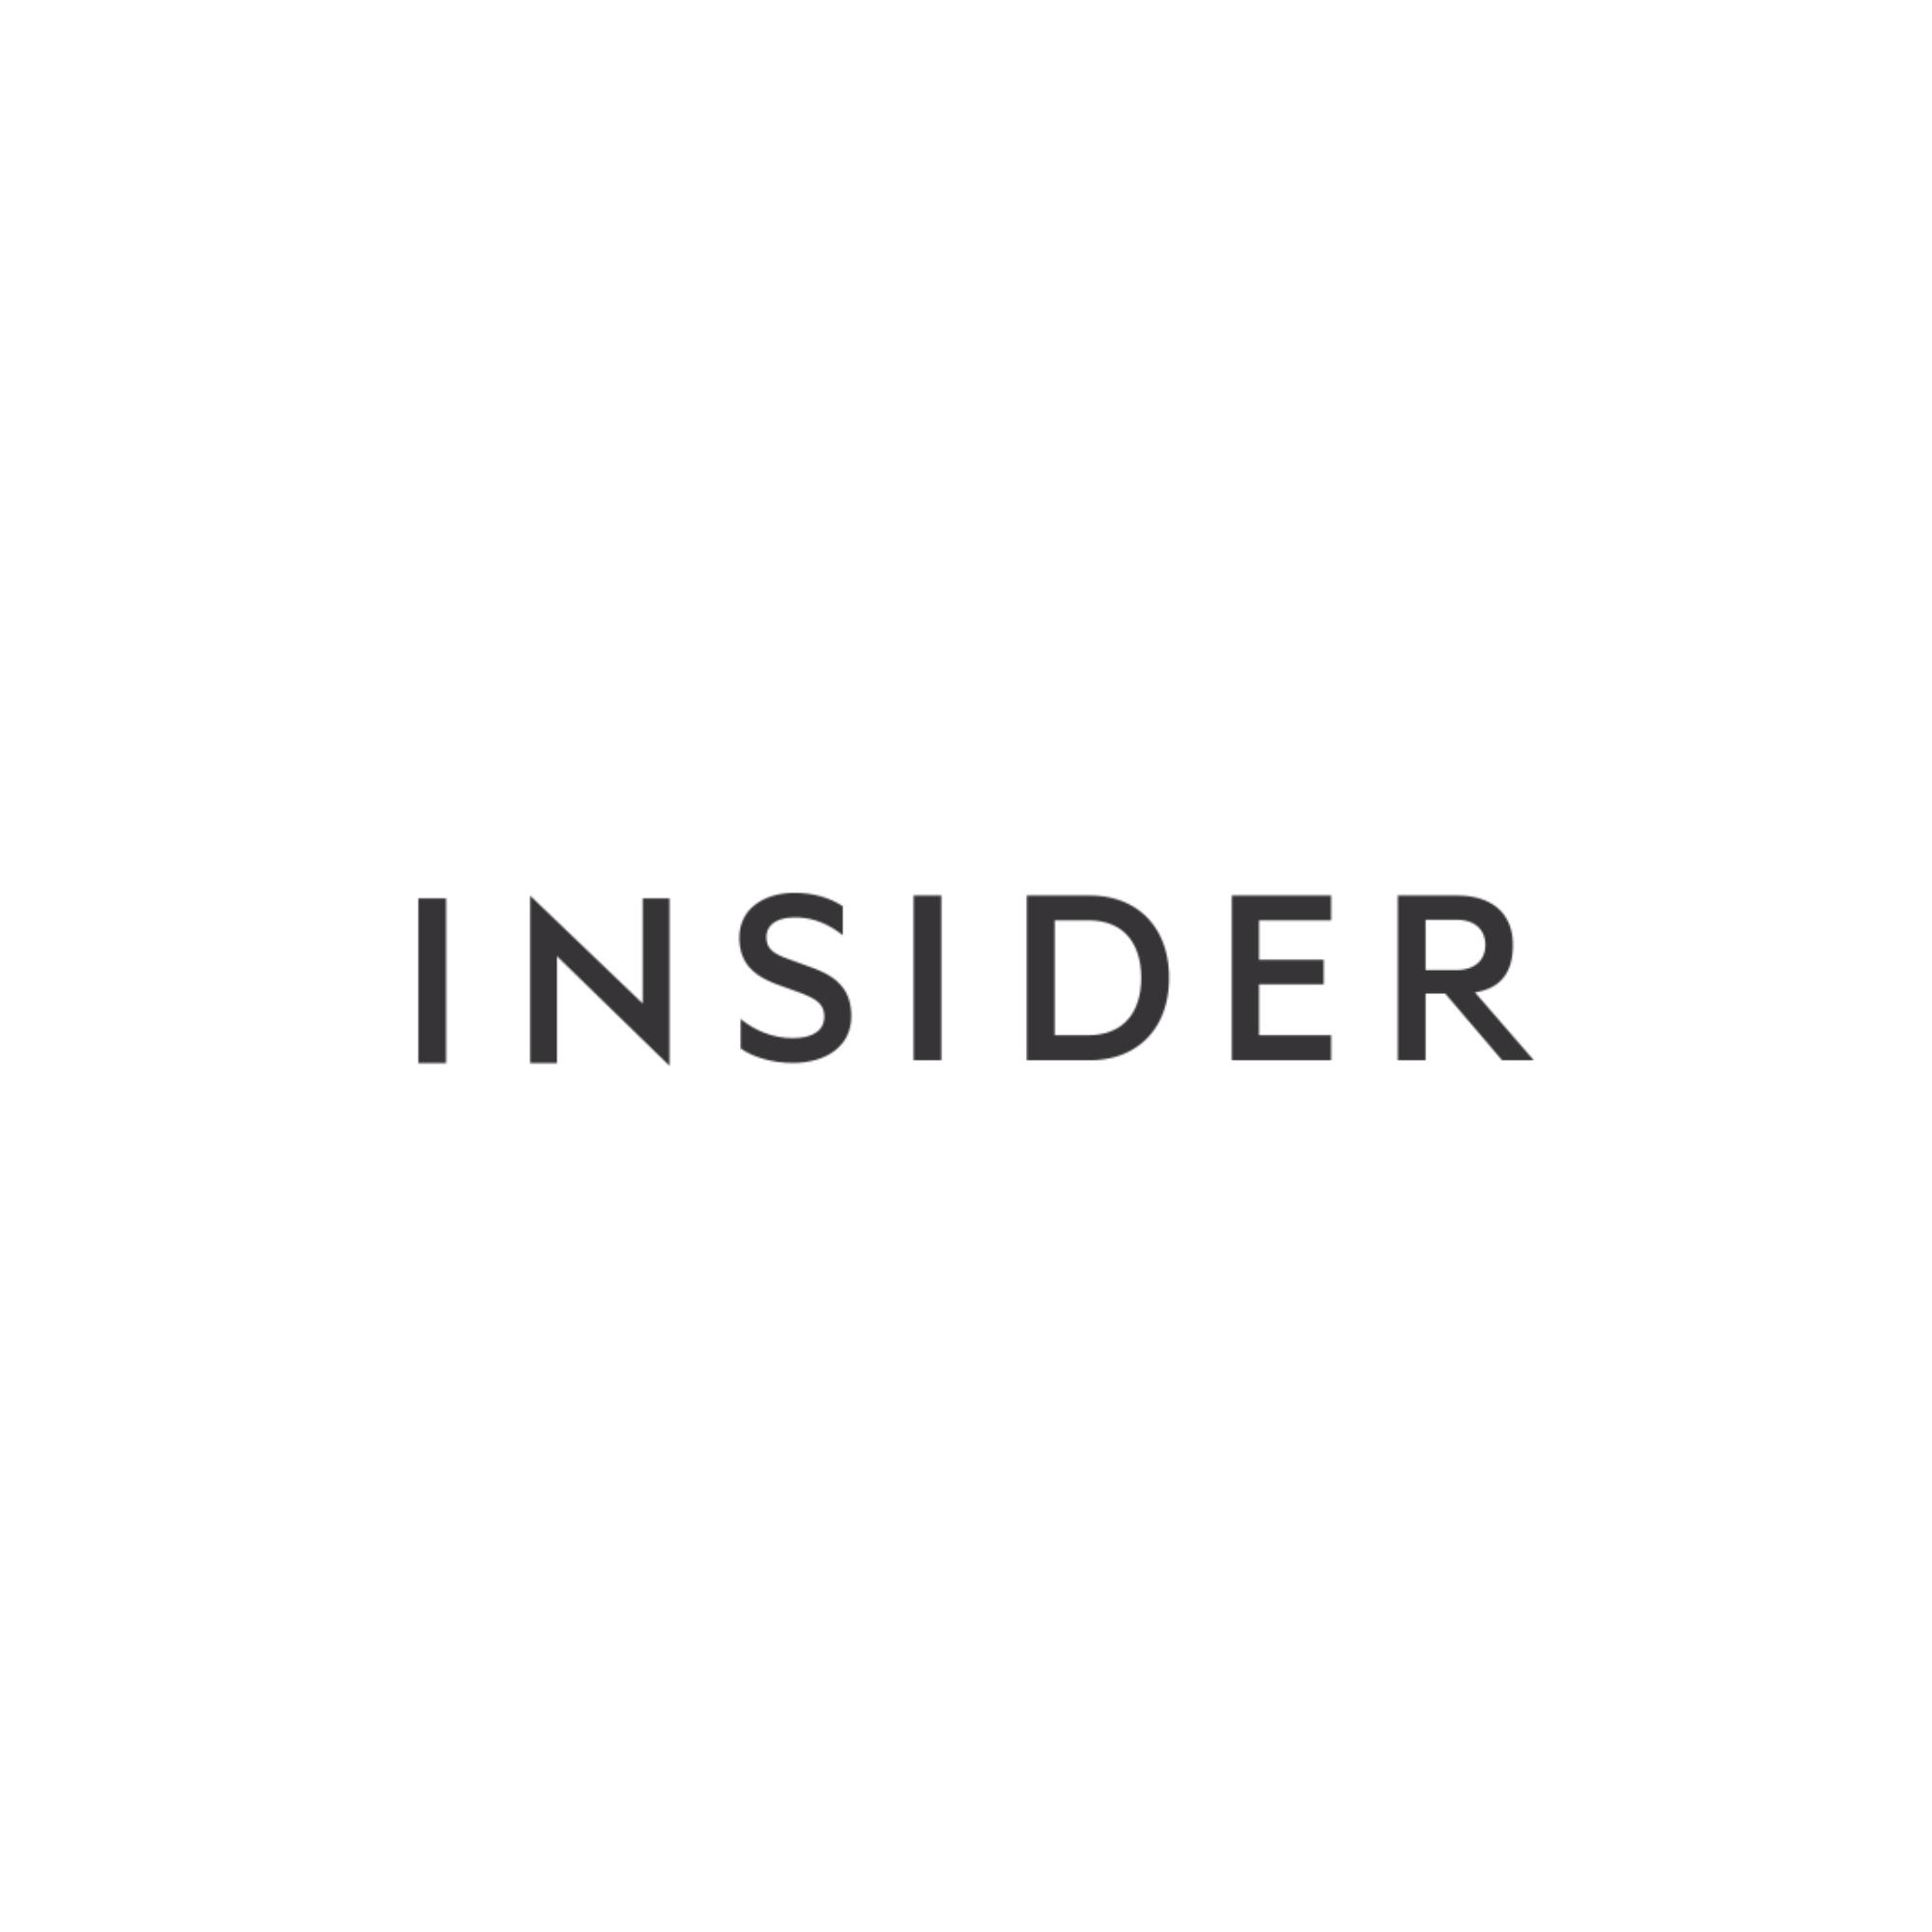 insider-logo – Poshmark PR